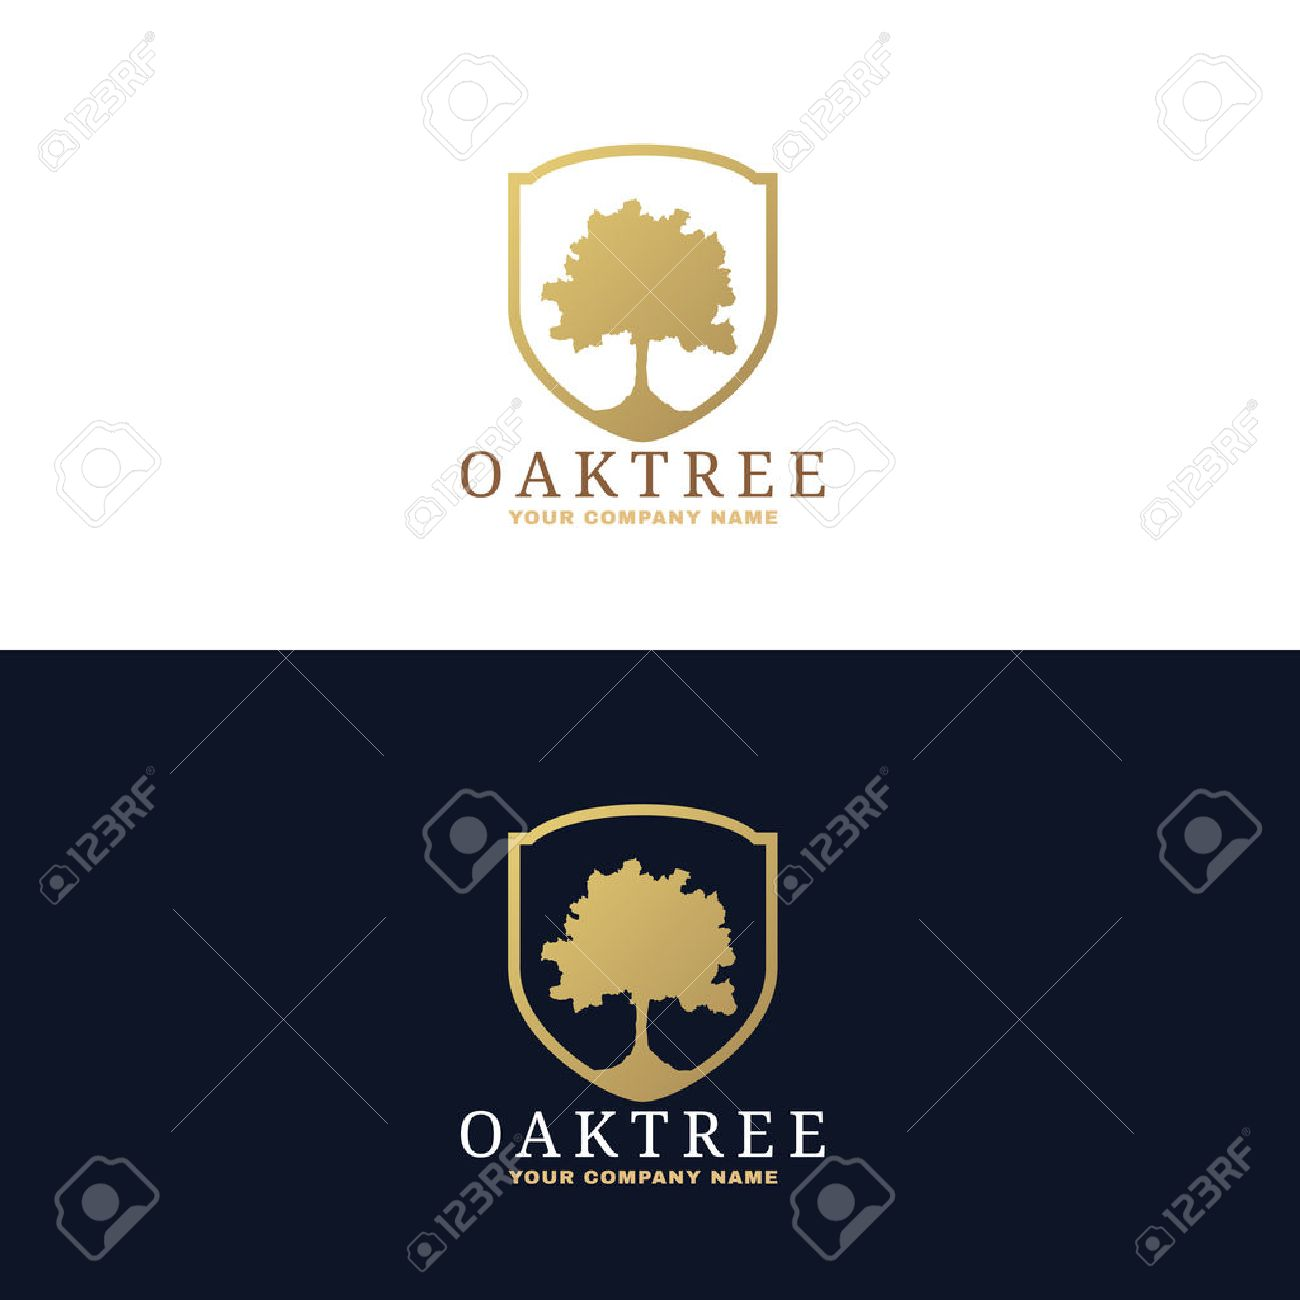 Gold And Dark Blue Oak Tree Logo Vector Design Stock